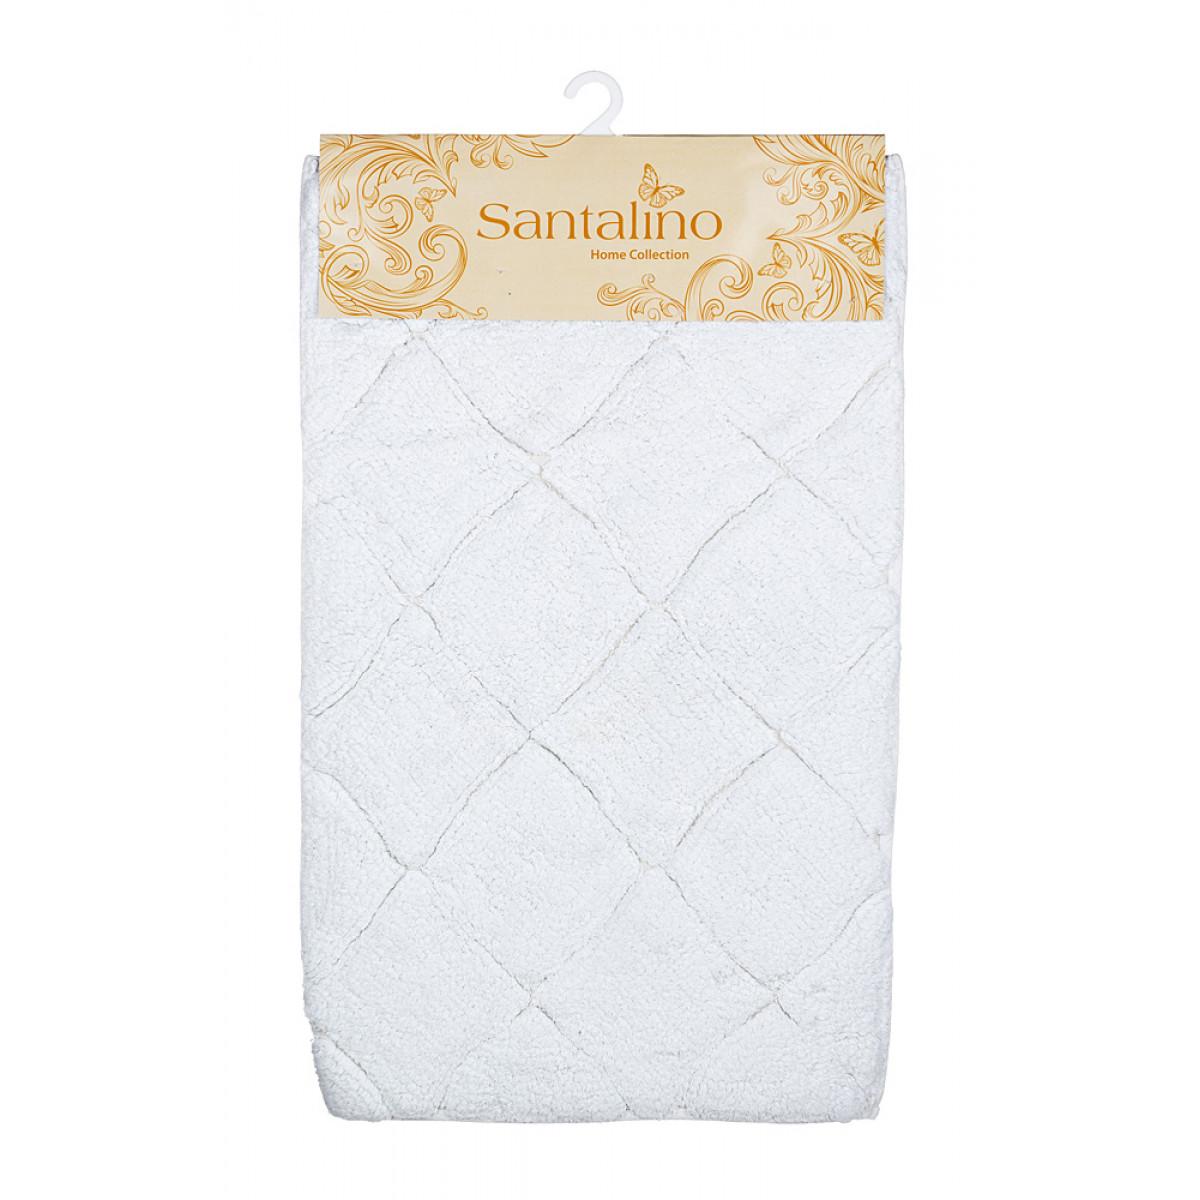 Аксессуары для ванной и туалета Santalino Коврик для ванной Вайт (50х80 см) коврик для ванной арти м 50х80 см грин